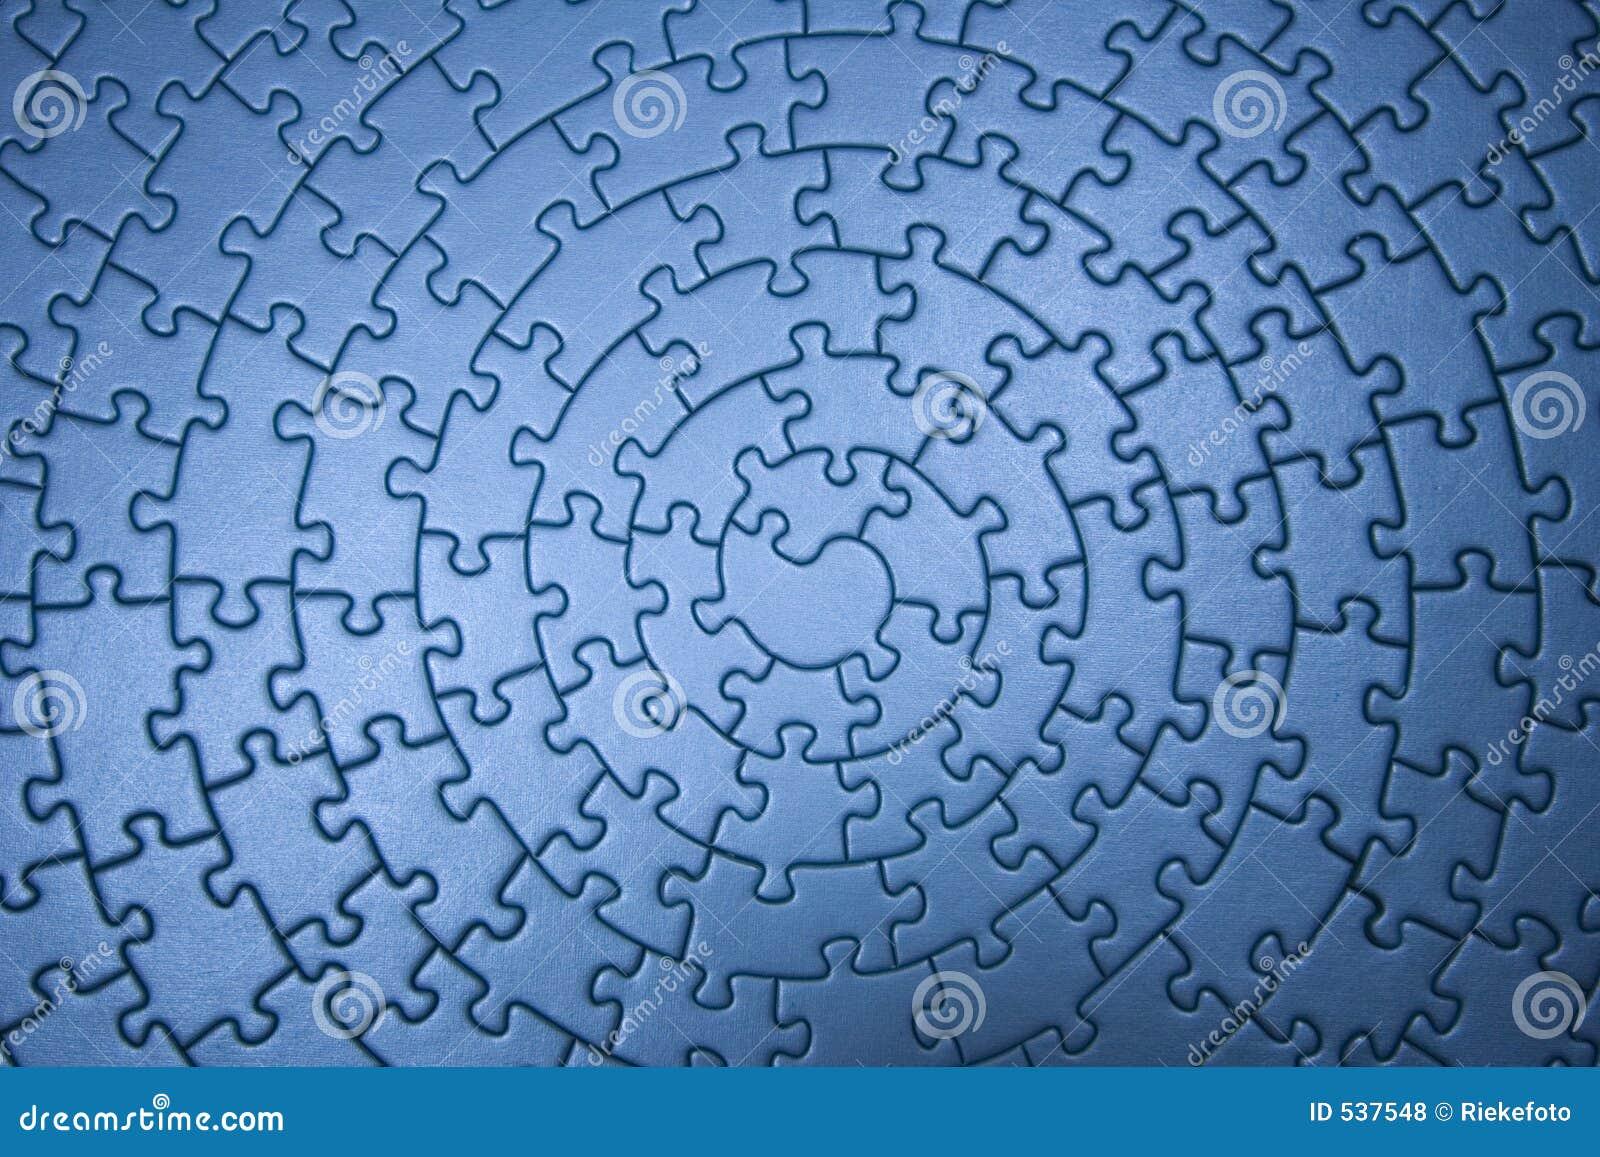 Complete Blue Jigsaw Wide Angle Stock Photo Image 537548